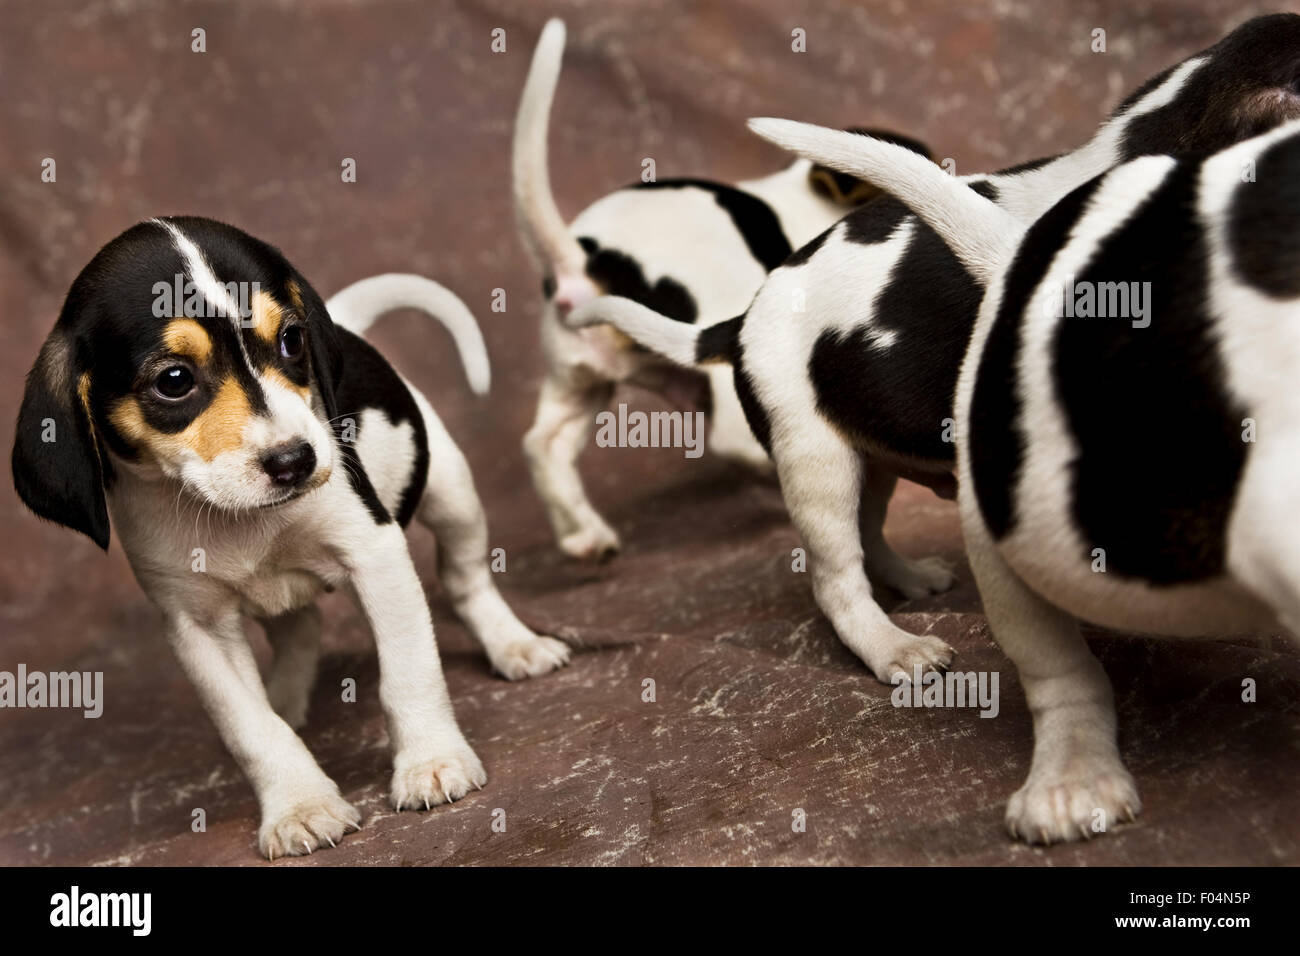 reife Beagle zum Verkauf